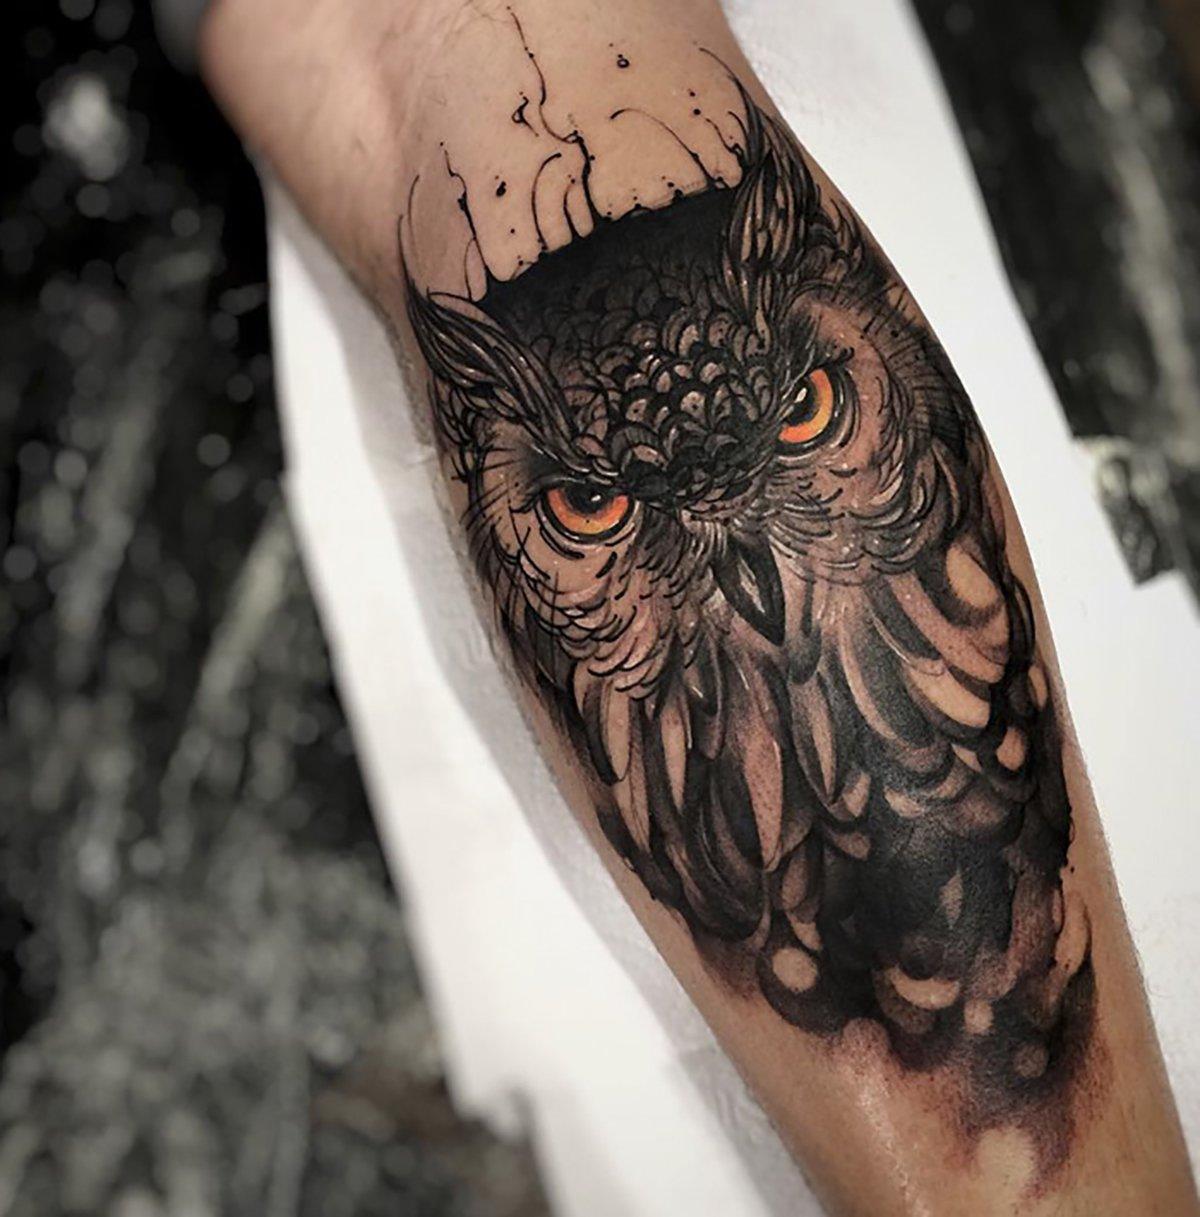 20 Tatuajes De Aves En Diferentes Partes Del Cuerpo